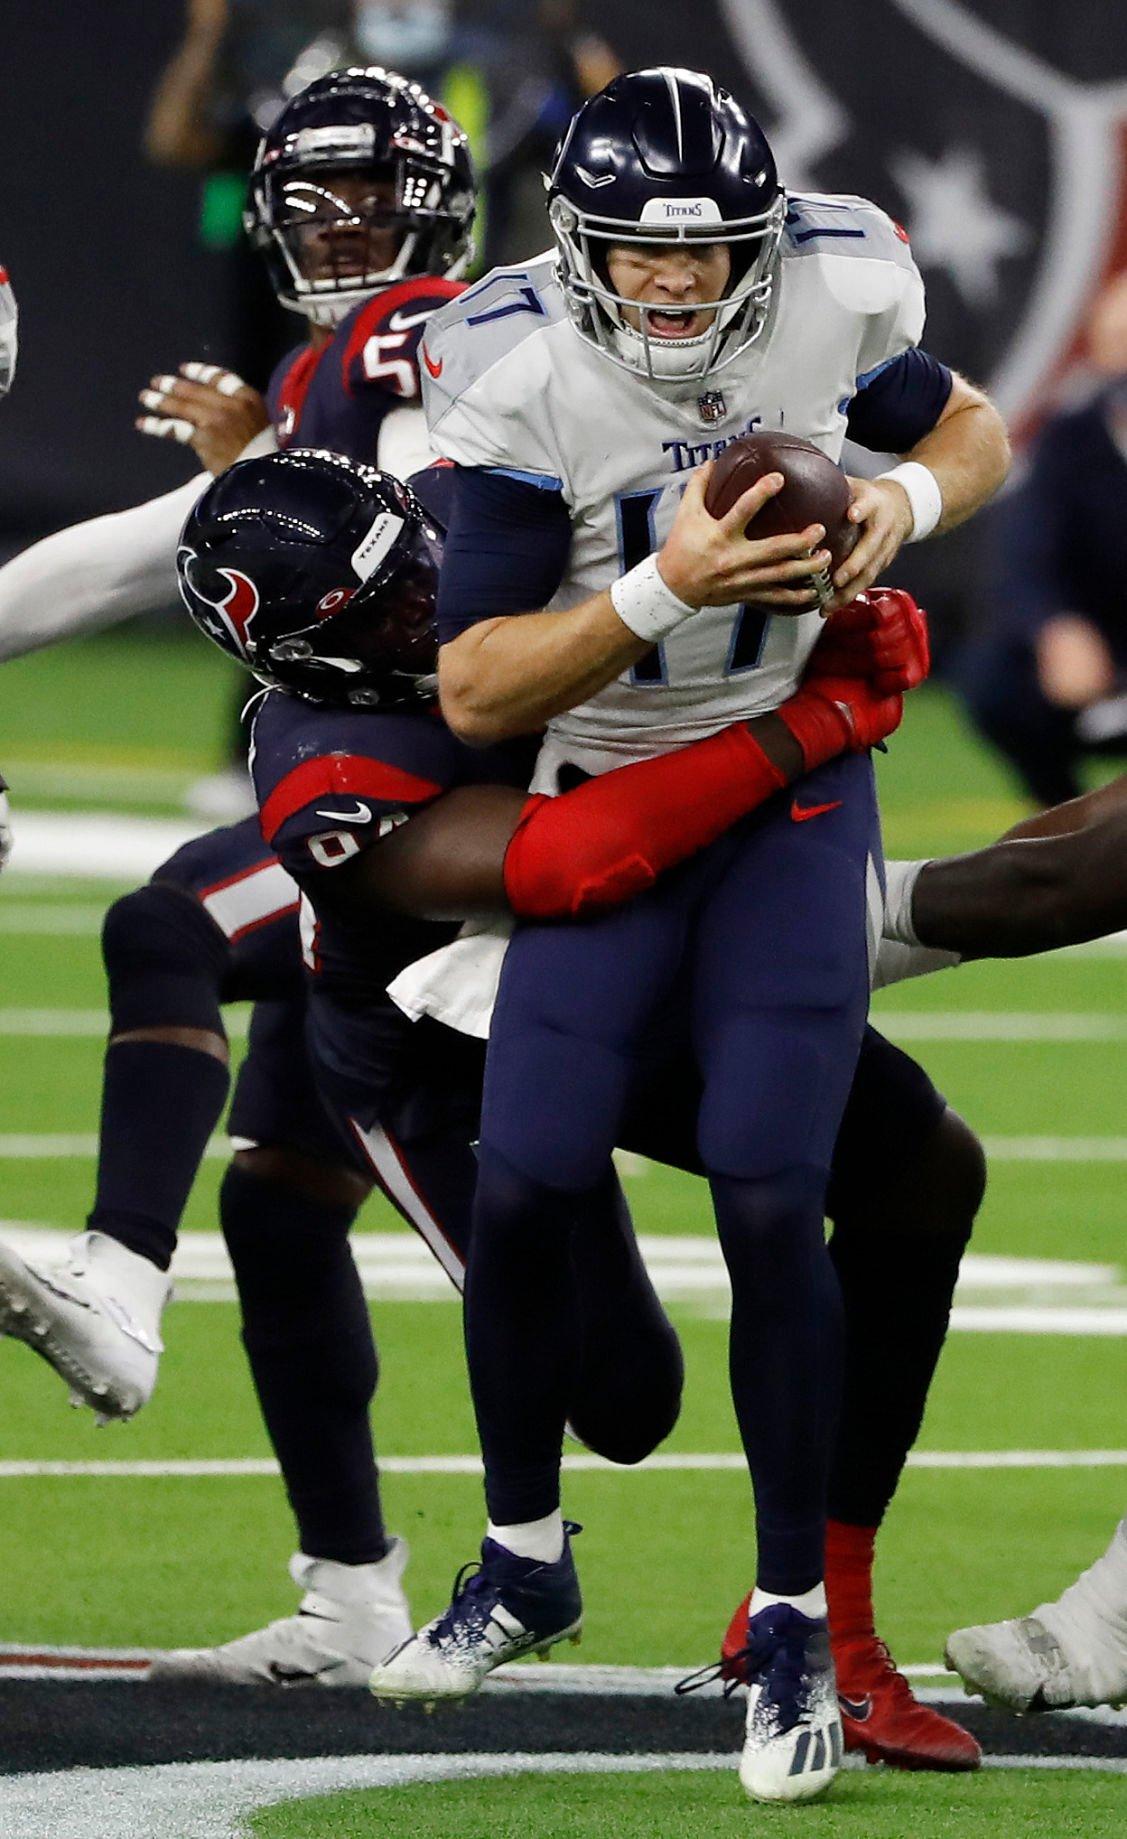 Houston Texans vs. Tennessee Titans